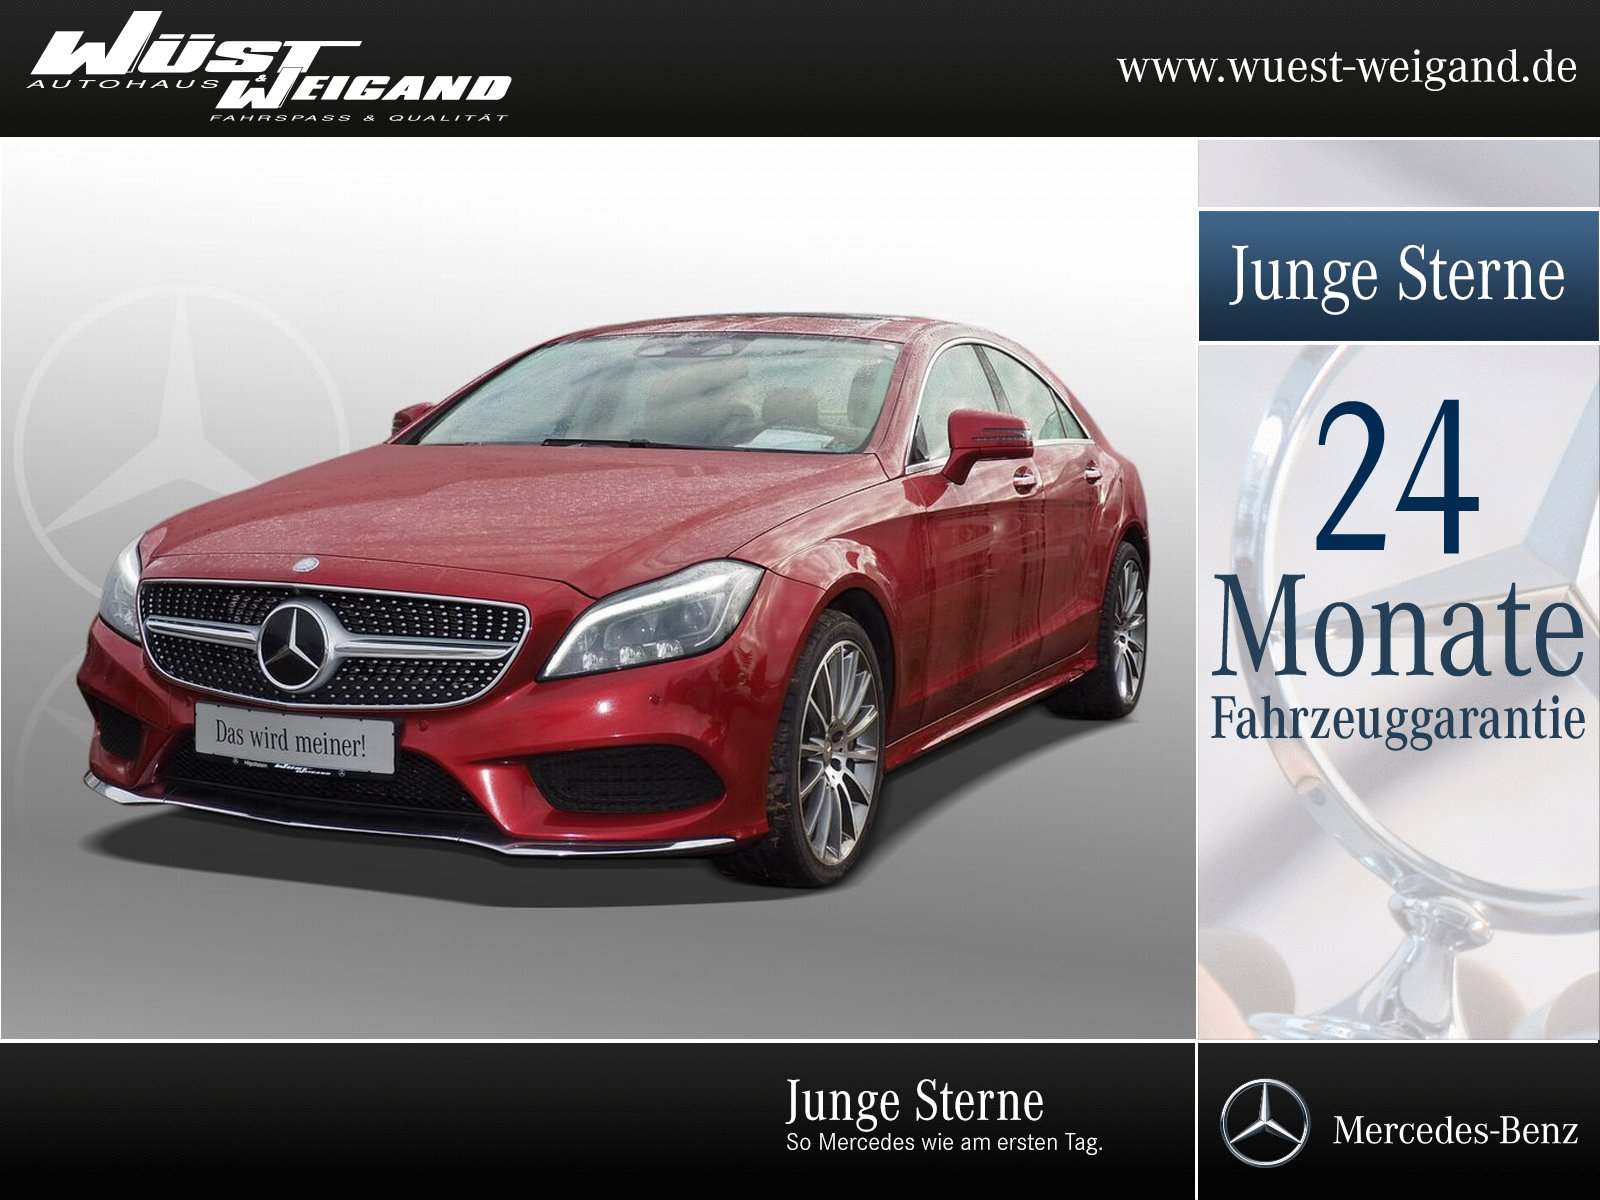 Mercedes-Benz CLS 500 4Matic AMG-Line+SHD+Navigation+Distronic, Jahr 2015, Benzin